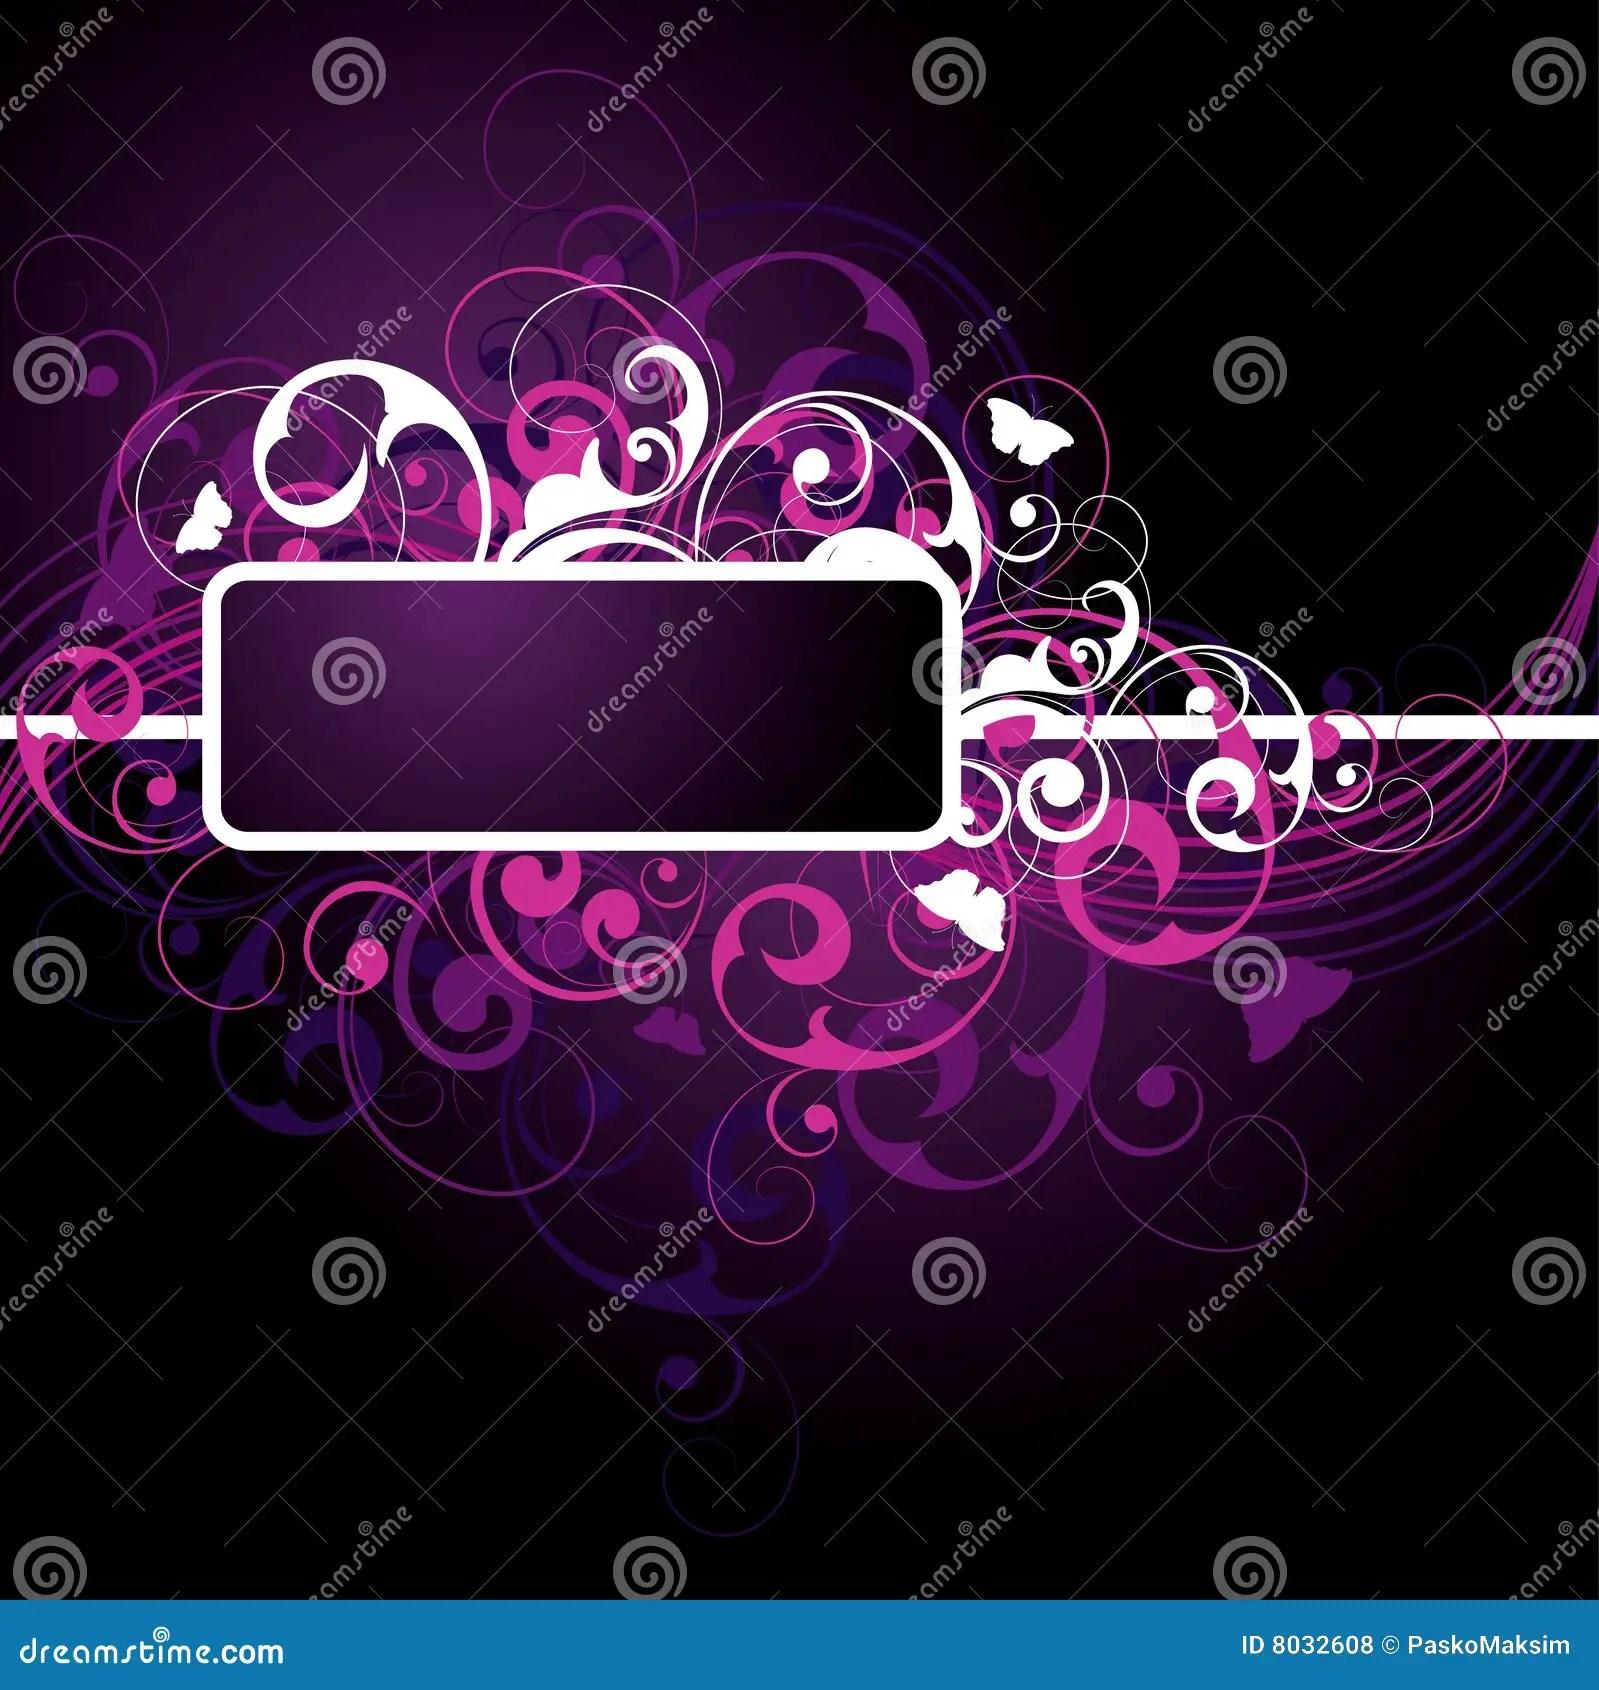 Black Silver Wallpaper Designs Fancy Dark Purple Background Stock Vector Image 8032608